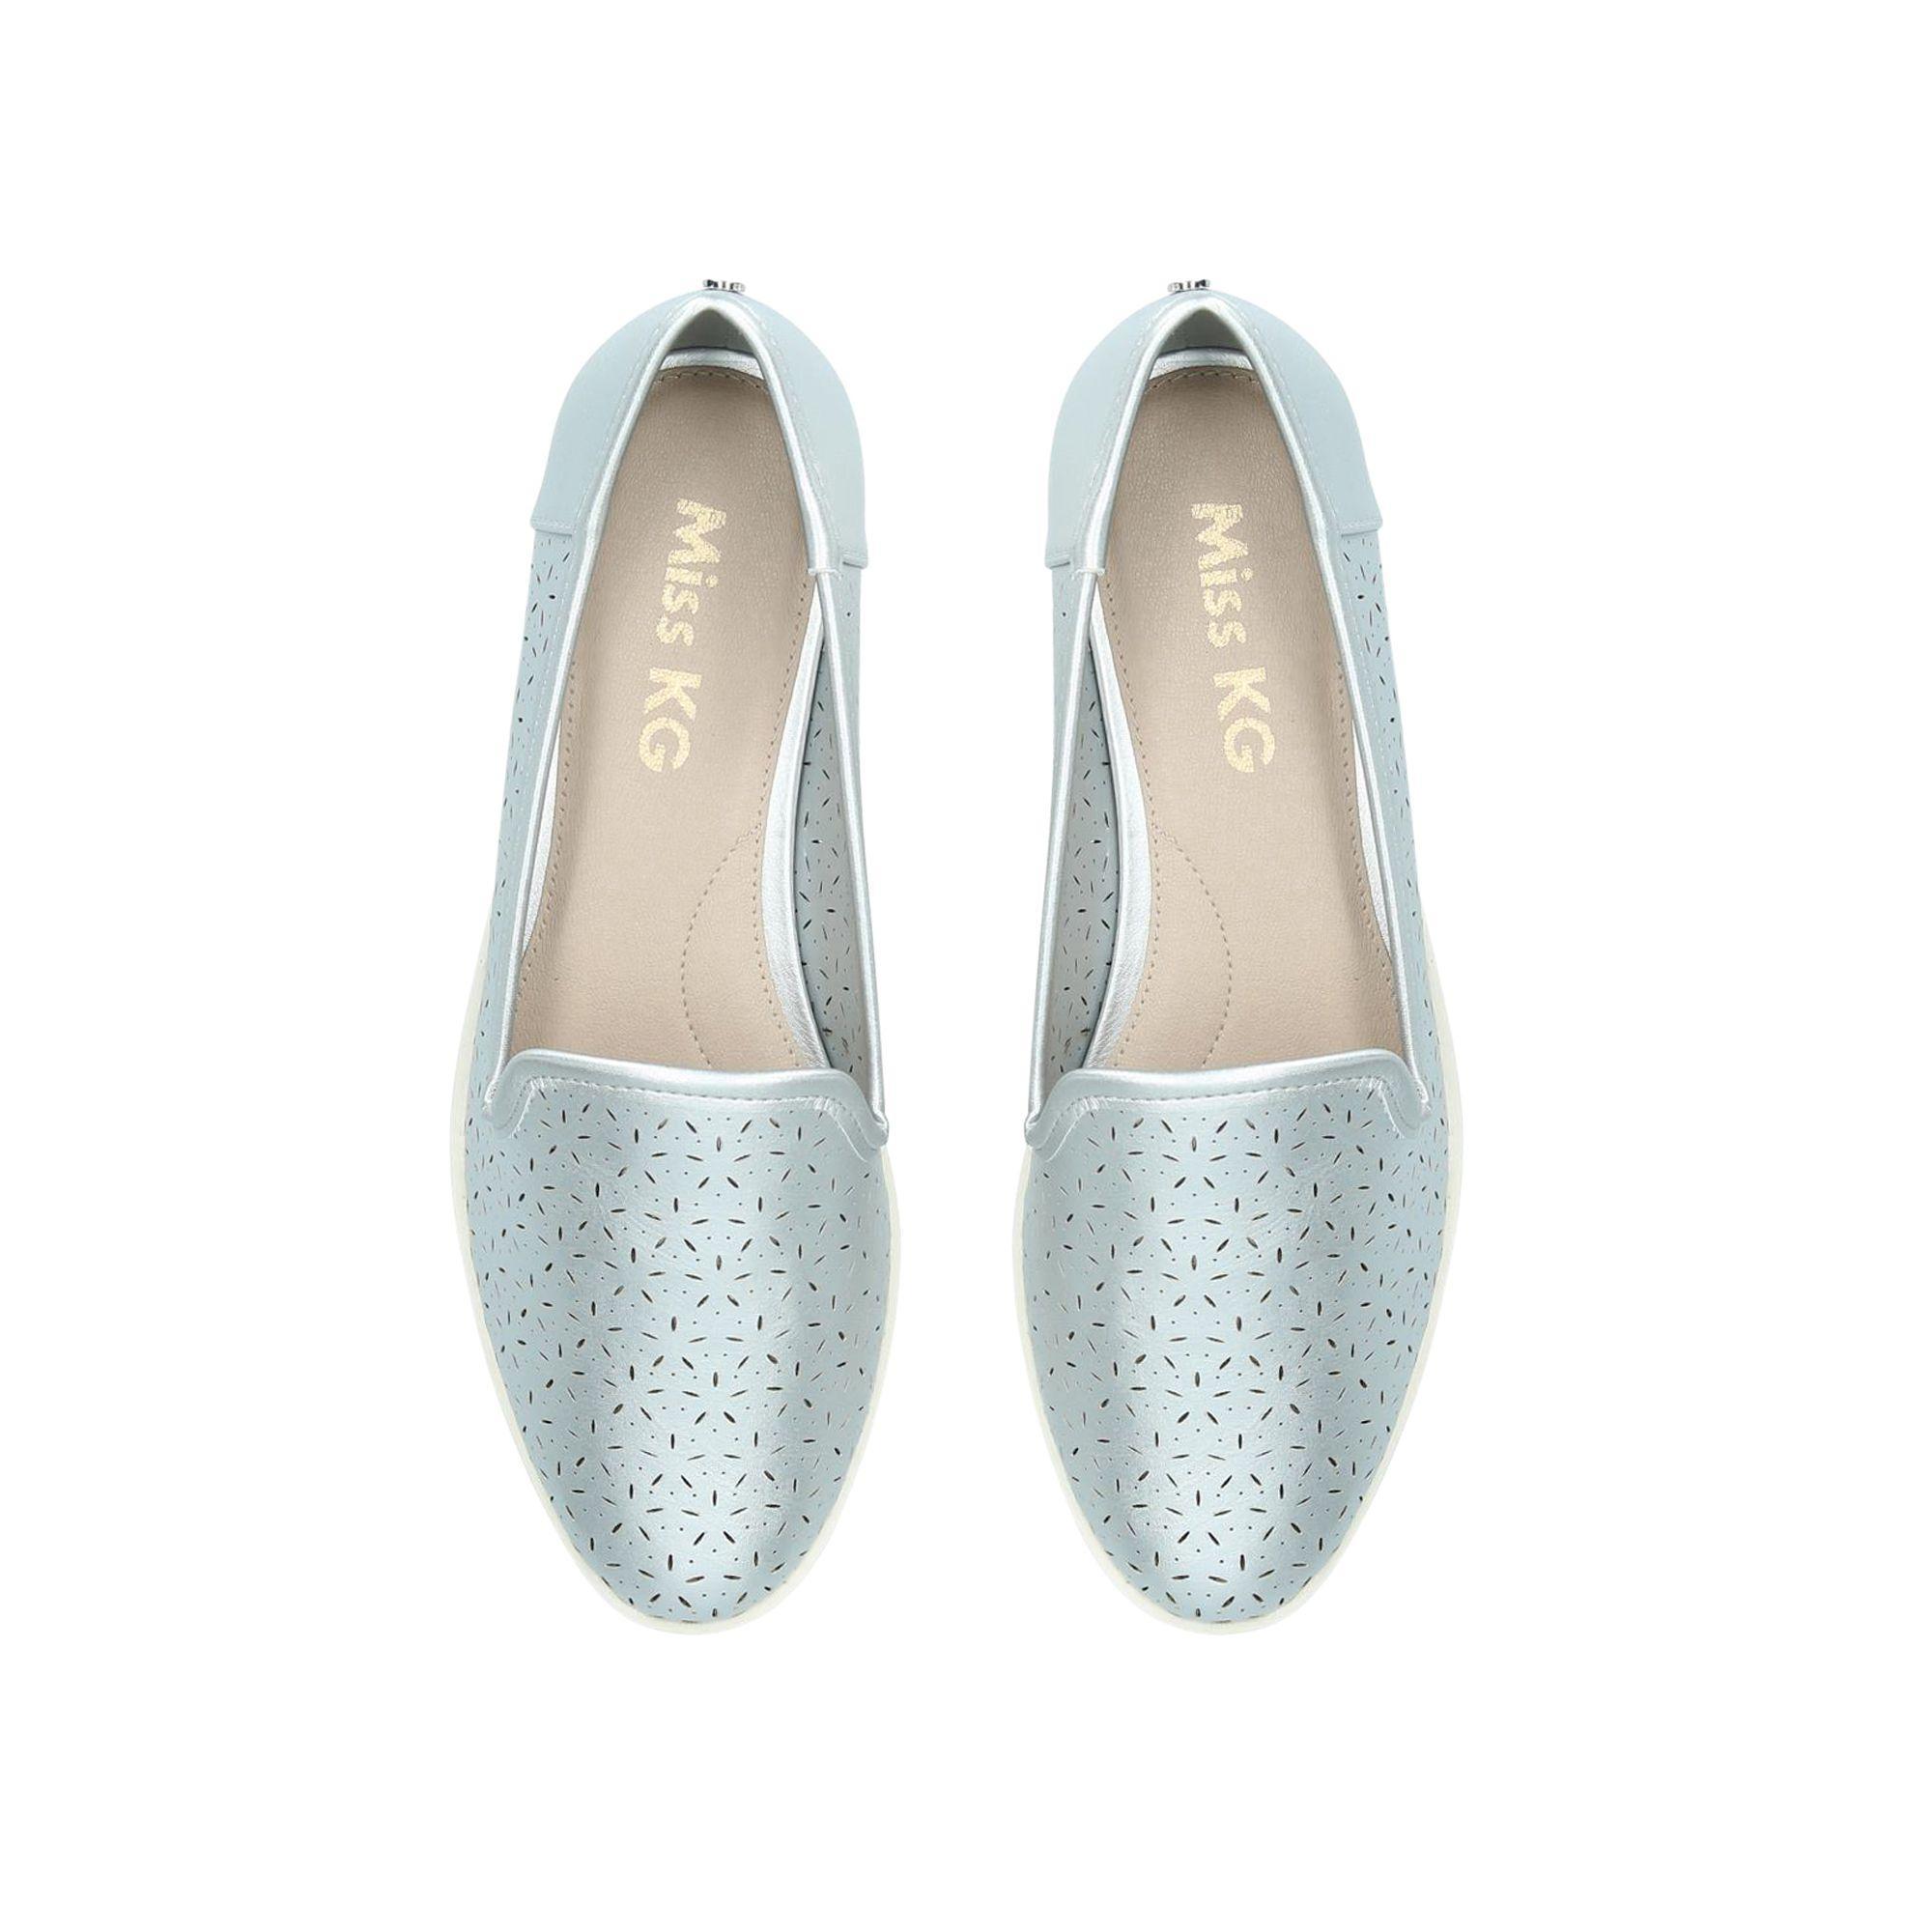 7e0aca1cd Miss Kg - Metallic  nora  Silver Flat Shoes - Lyst. View fullscreen